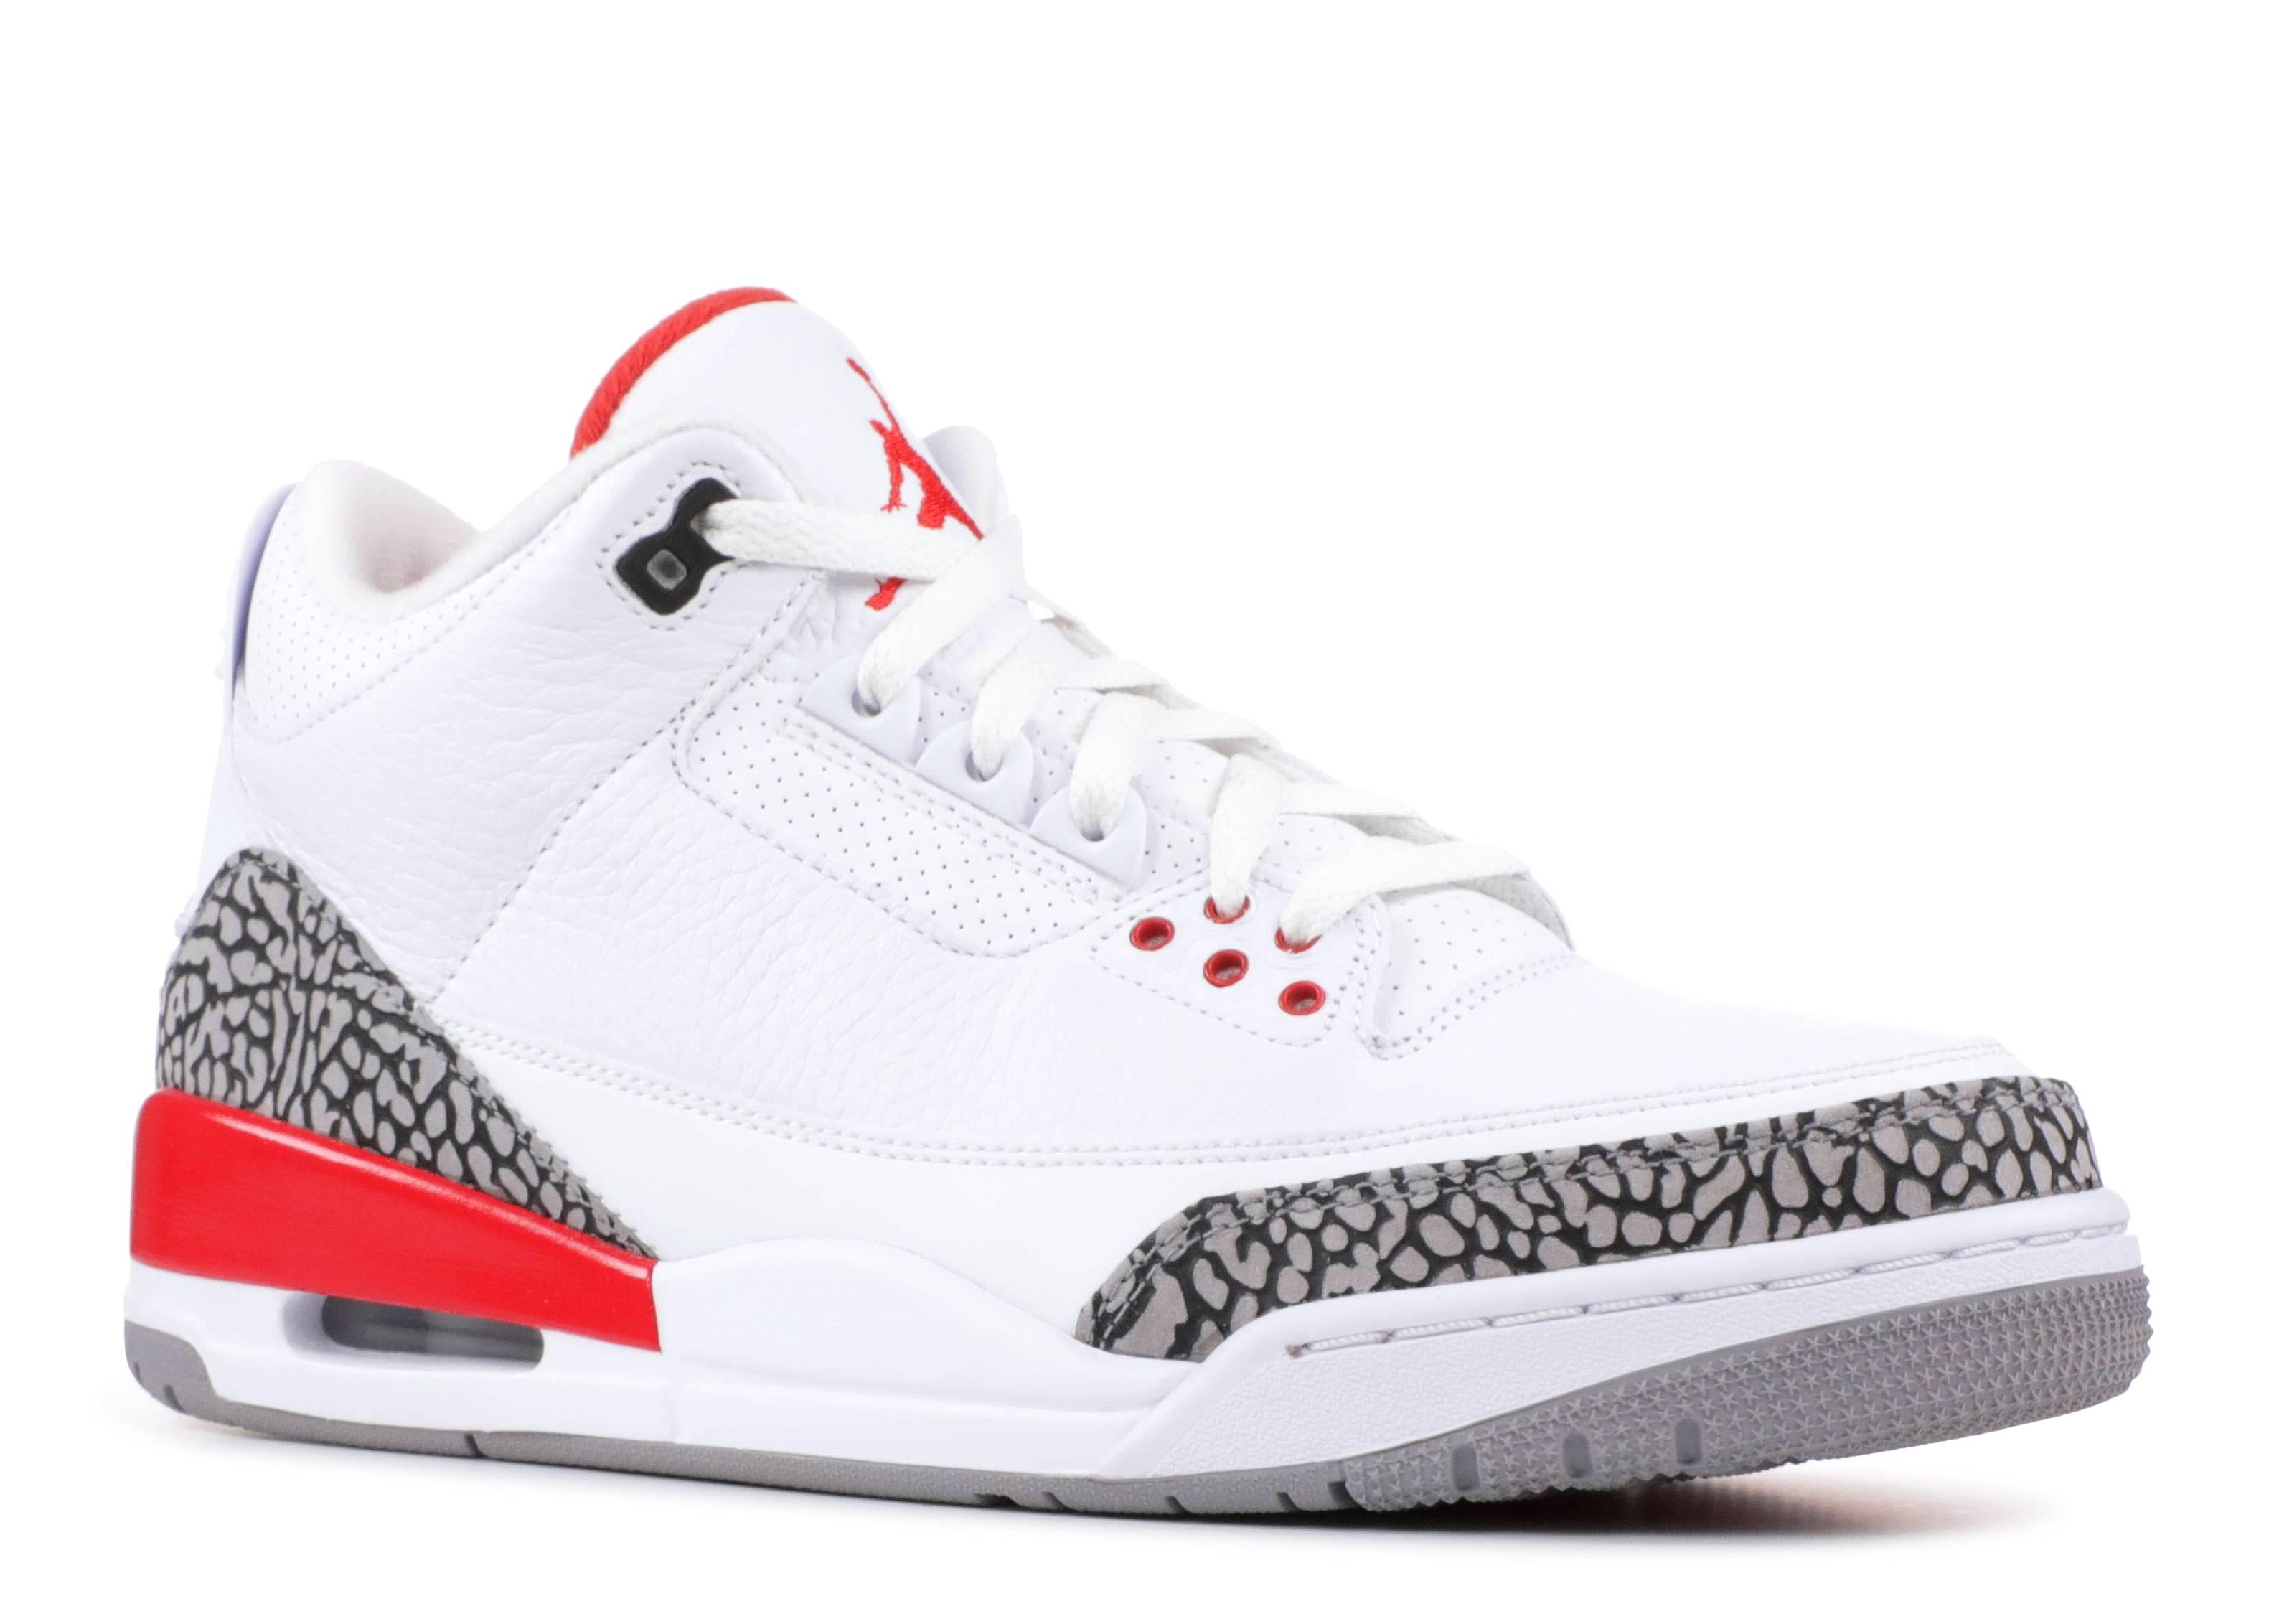 Air Jordan 3 Retro 'Hall of Fame'